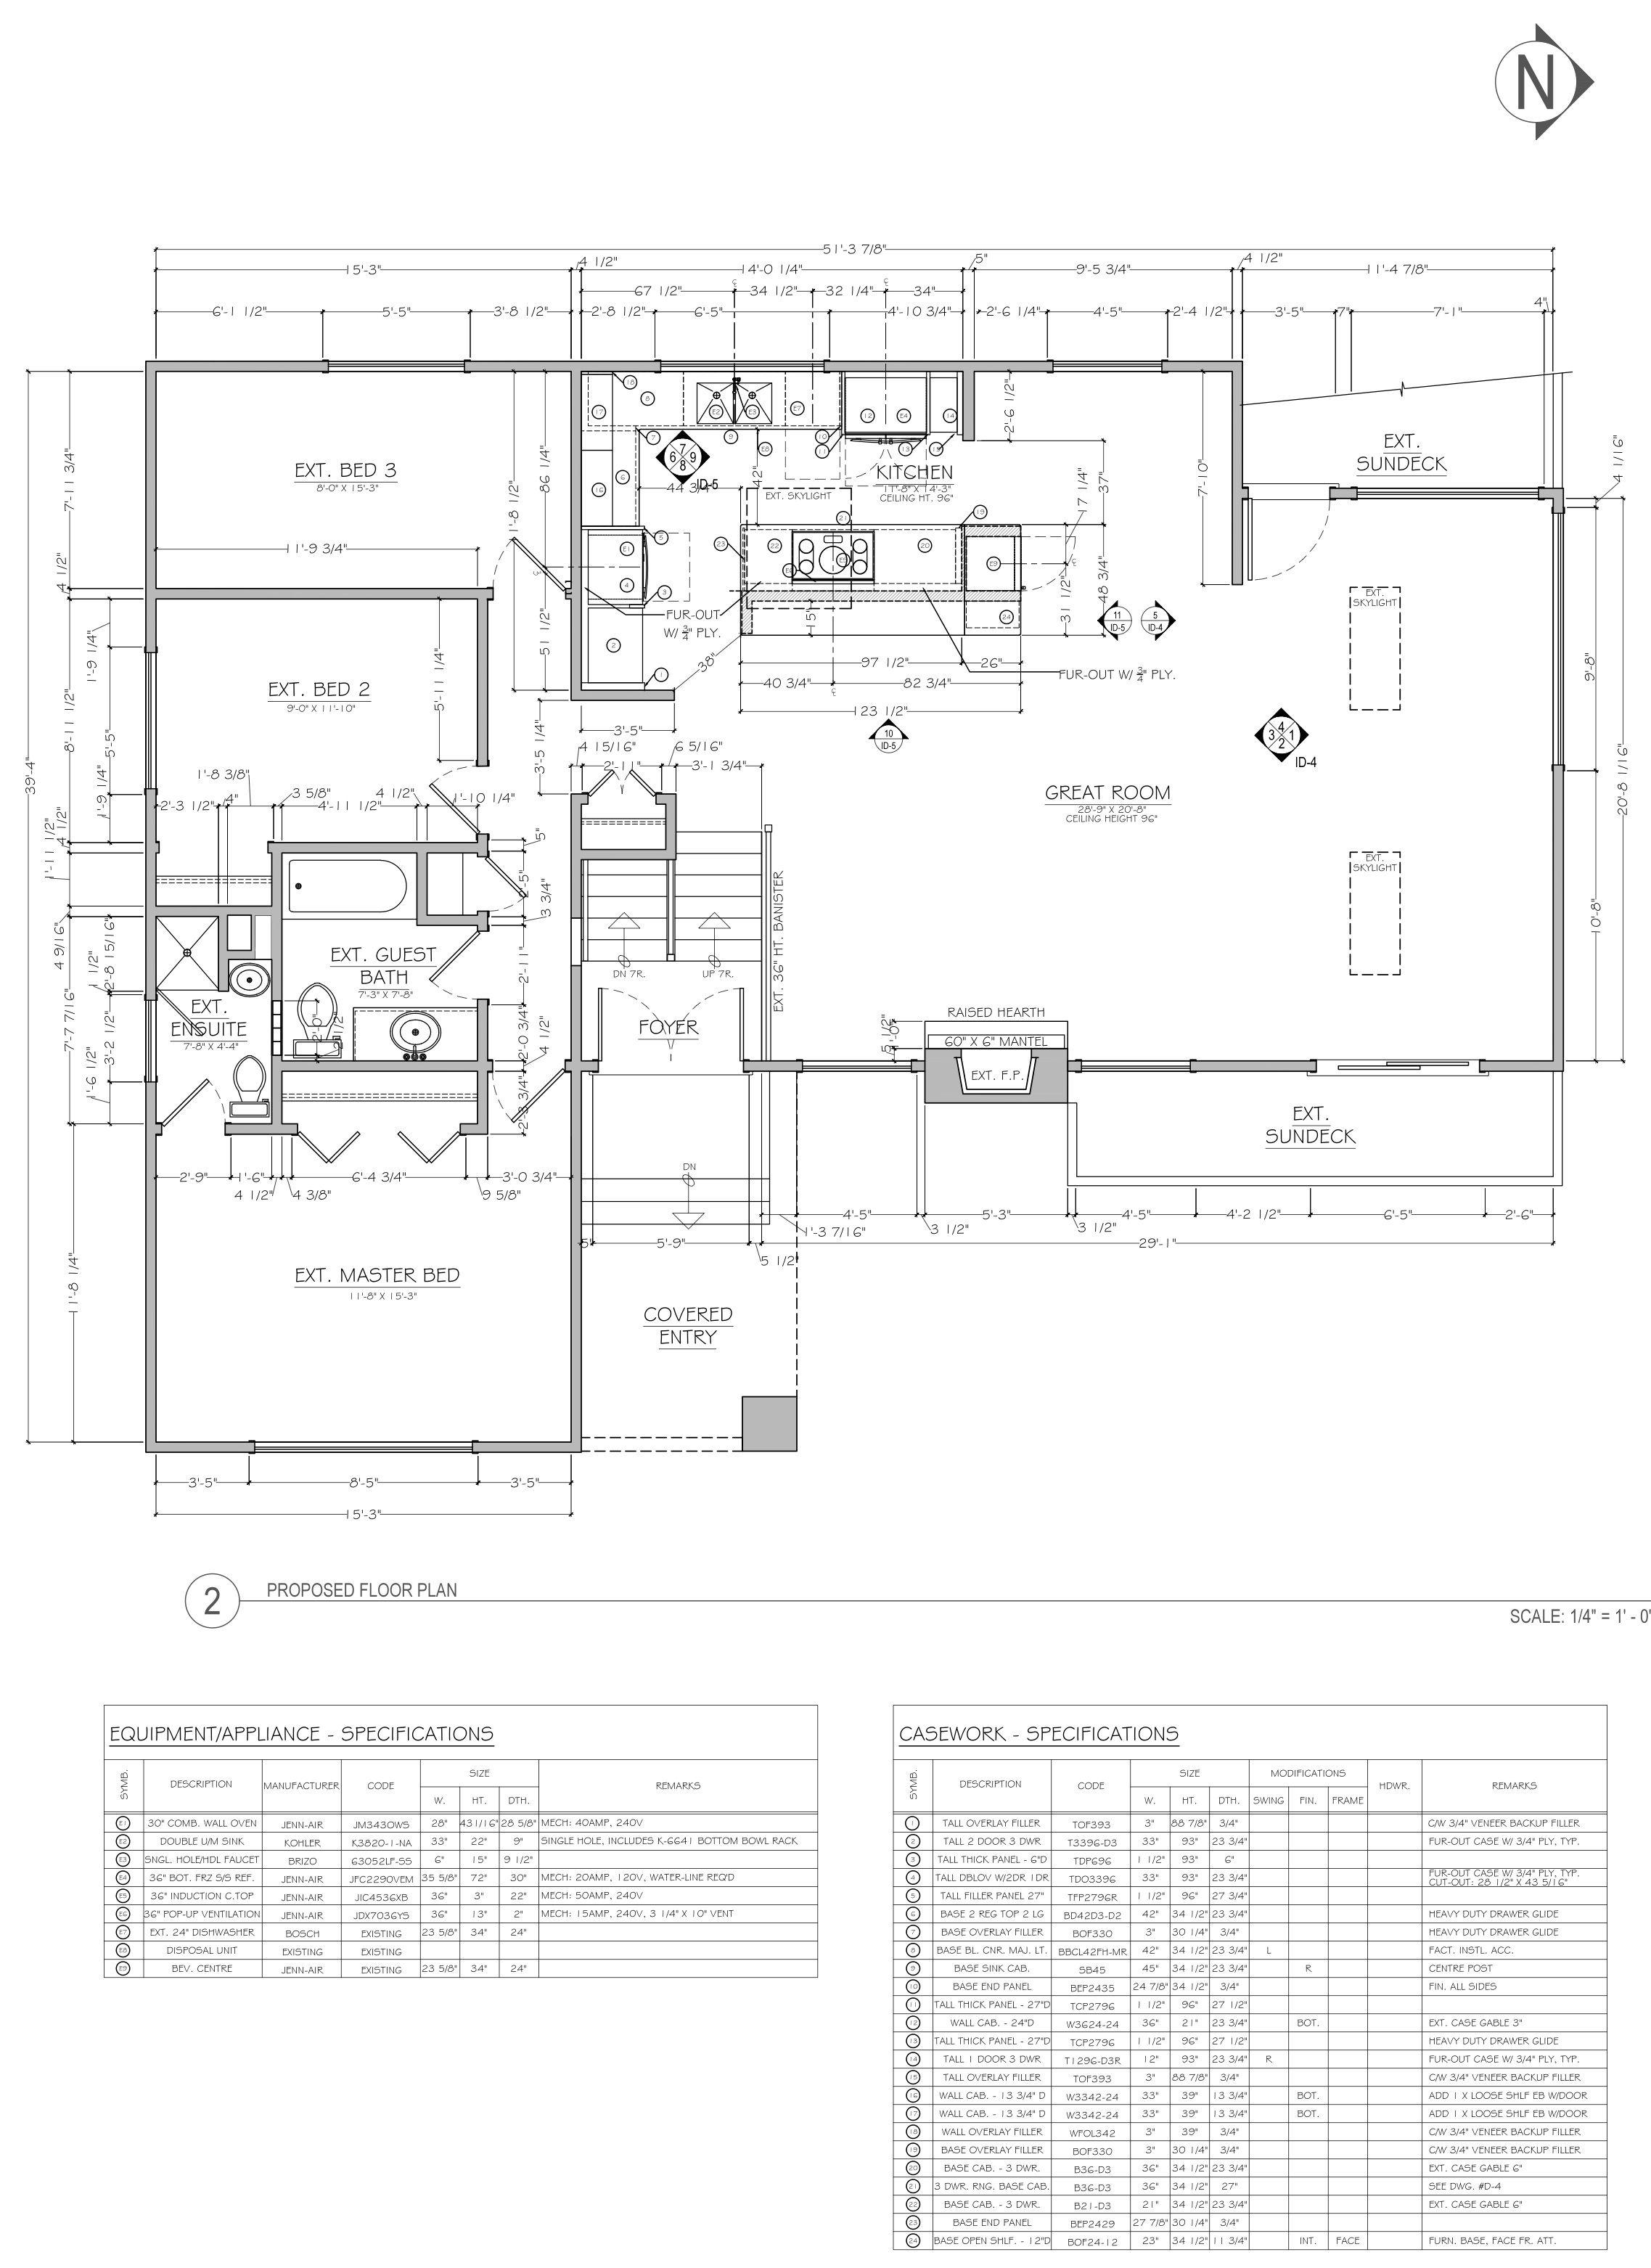 Kitchen Floor Plan Courtesy Corey Klassen Interior Design Floor Plans Kitchen Floor Plans Universal Design